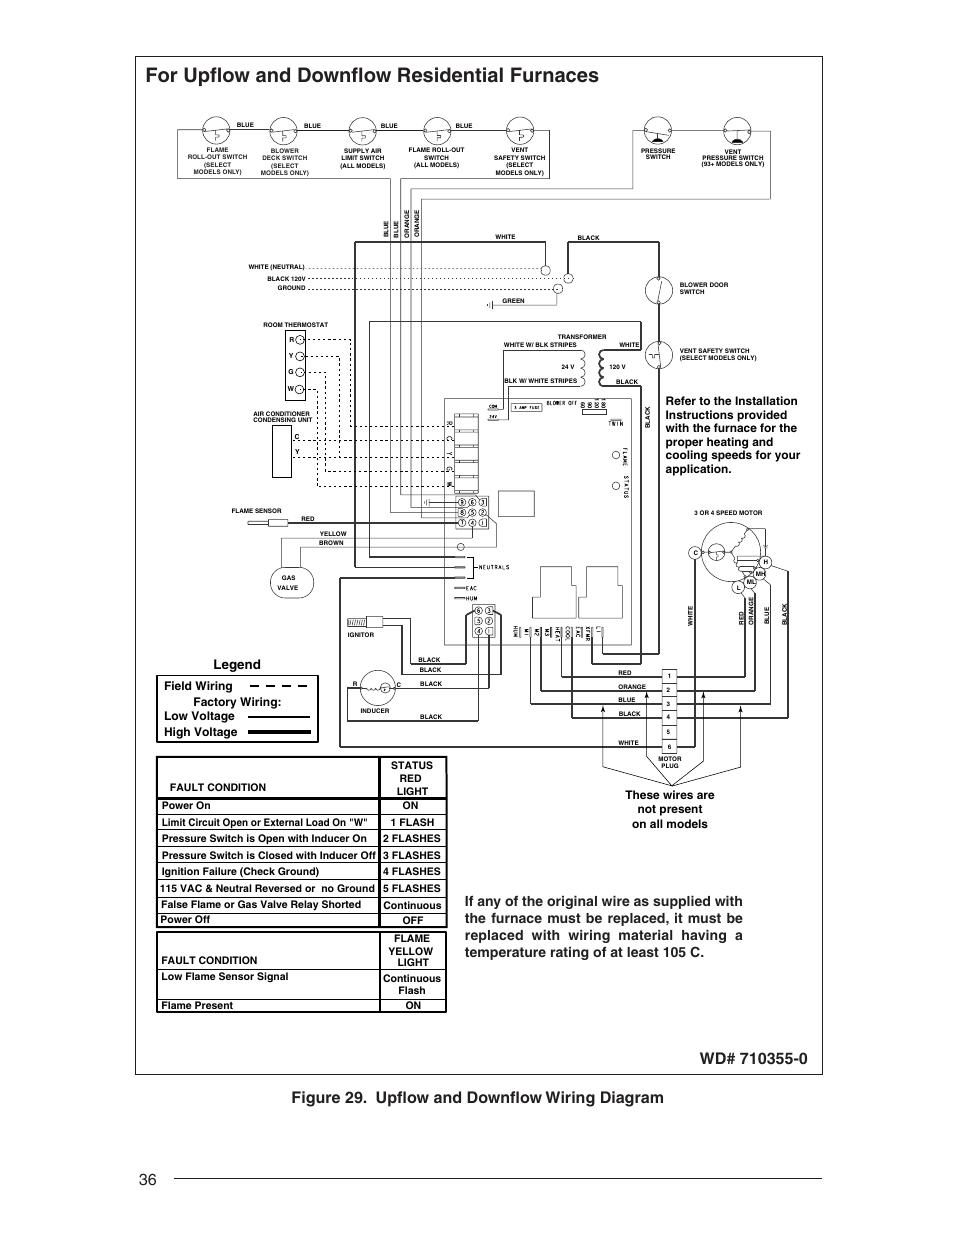 medium resolution of e2eb 017ha wiring diagram transformer diagrams wiring e2eb 012ha wiring diagram nordyne e2eb 017ha wiring diagram